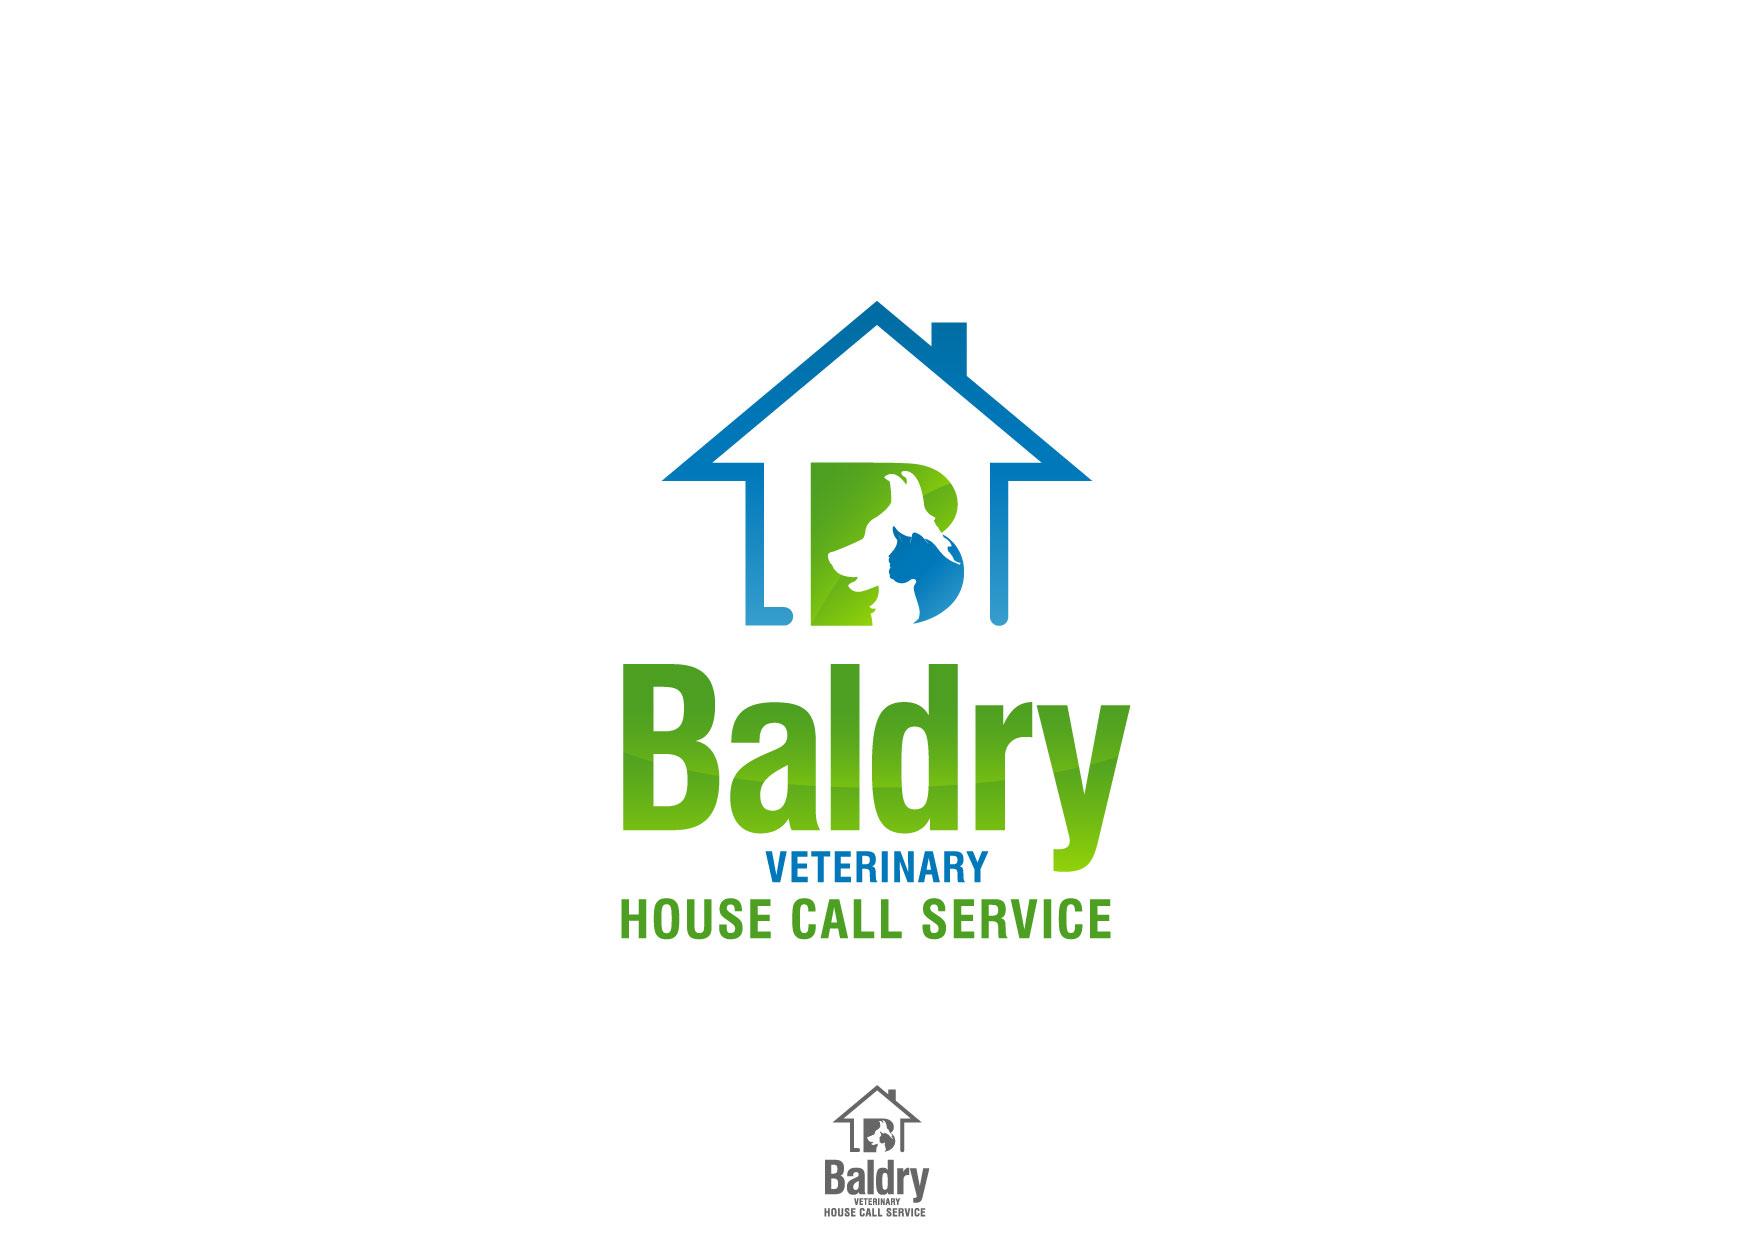 Logo Design by Nurgalih Destianto - Entry No. 172 in the Logo Design Contest Captivating Logo Design for Baldry Veterinary House Call Service.